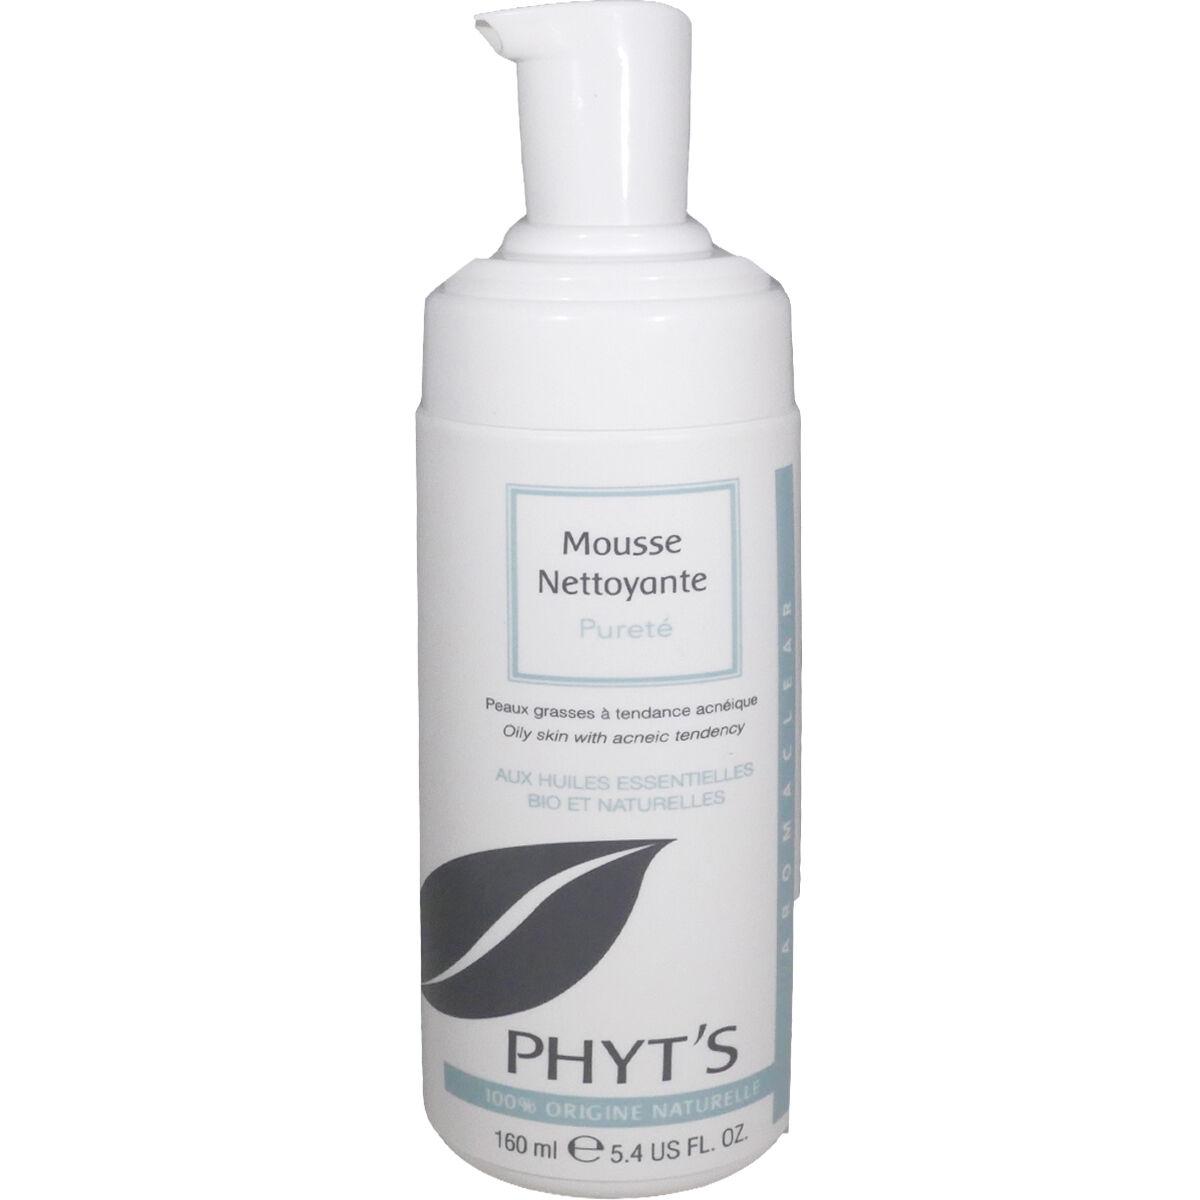 Phyt's mousse nettoyante purete 160 ml